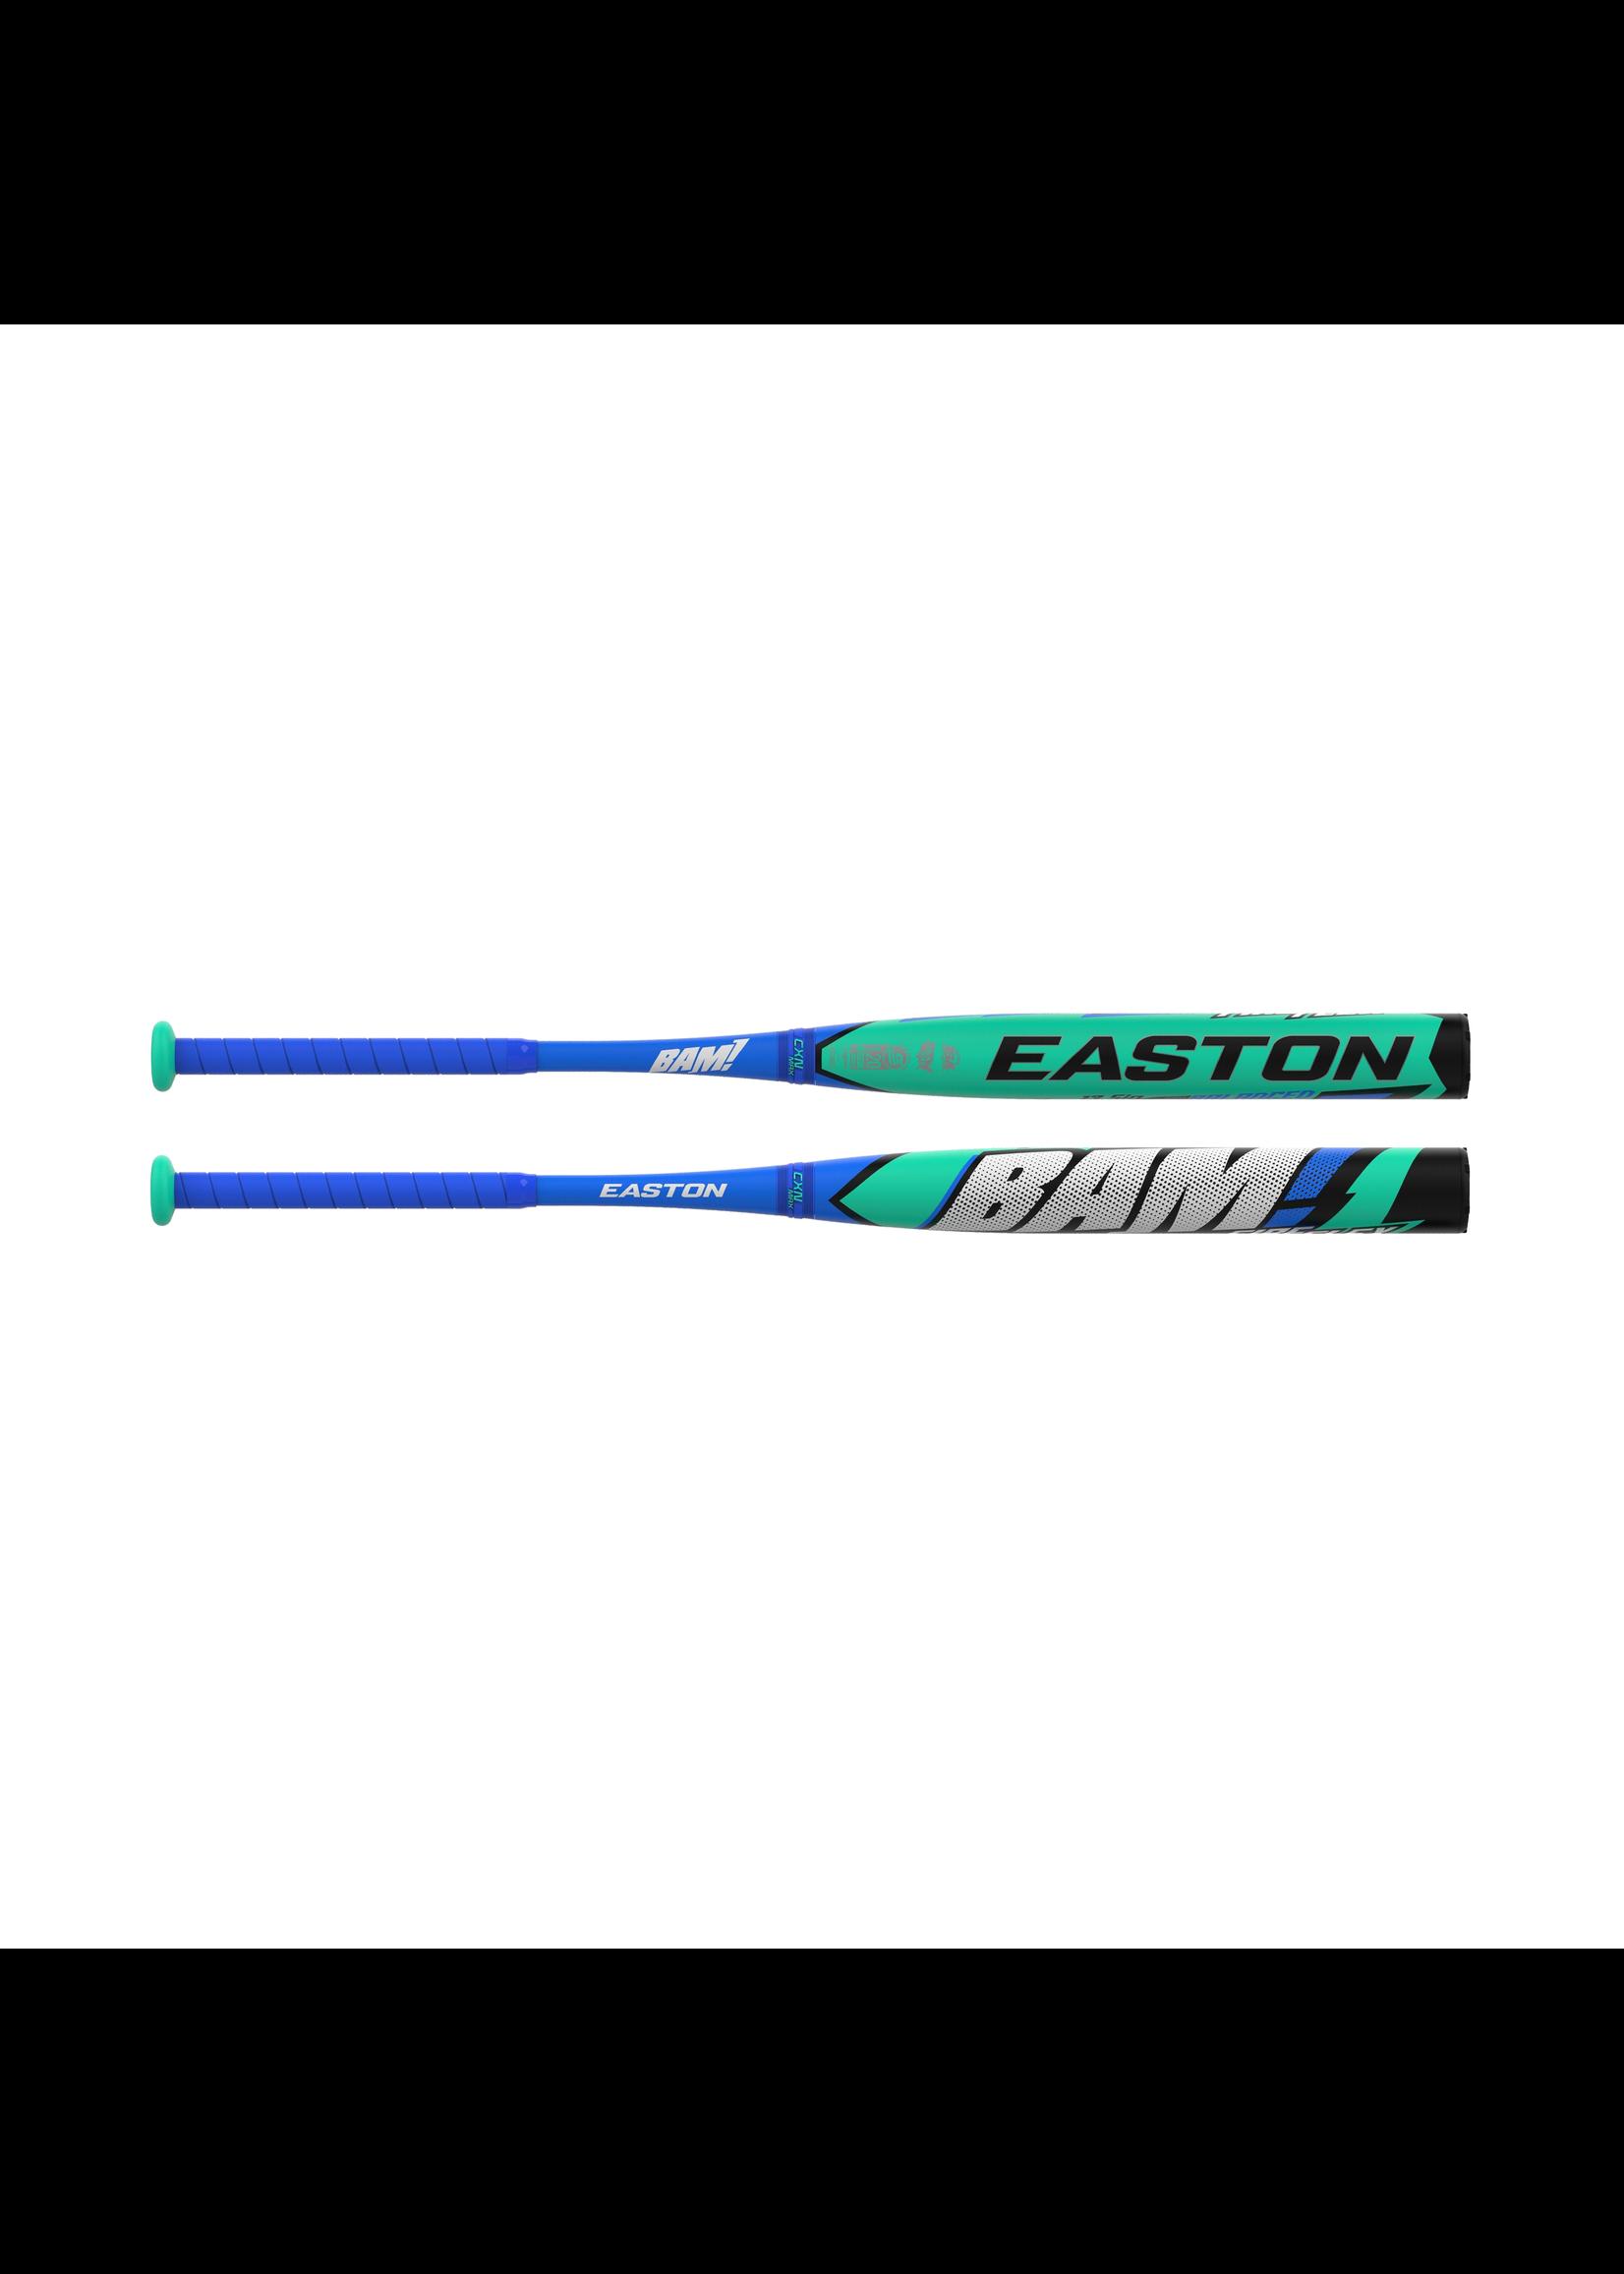 Easton Baseball (Canada) EASTON FIRE FLEX COMIC BAM BALANCED 13.5 USSSA BÂTON SLOWPITCH